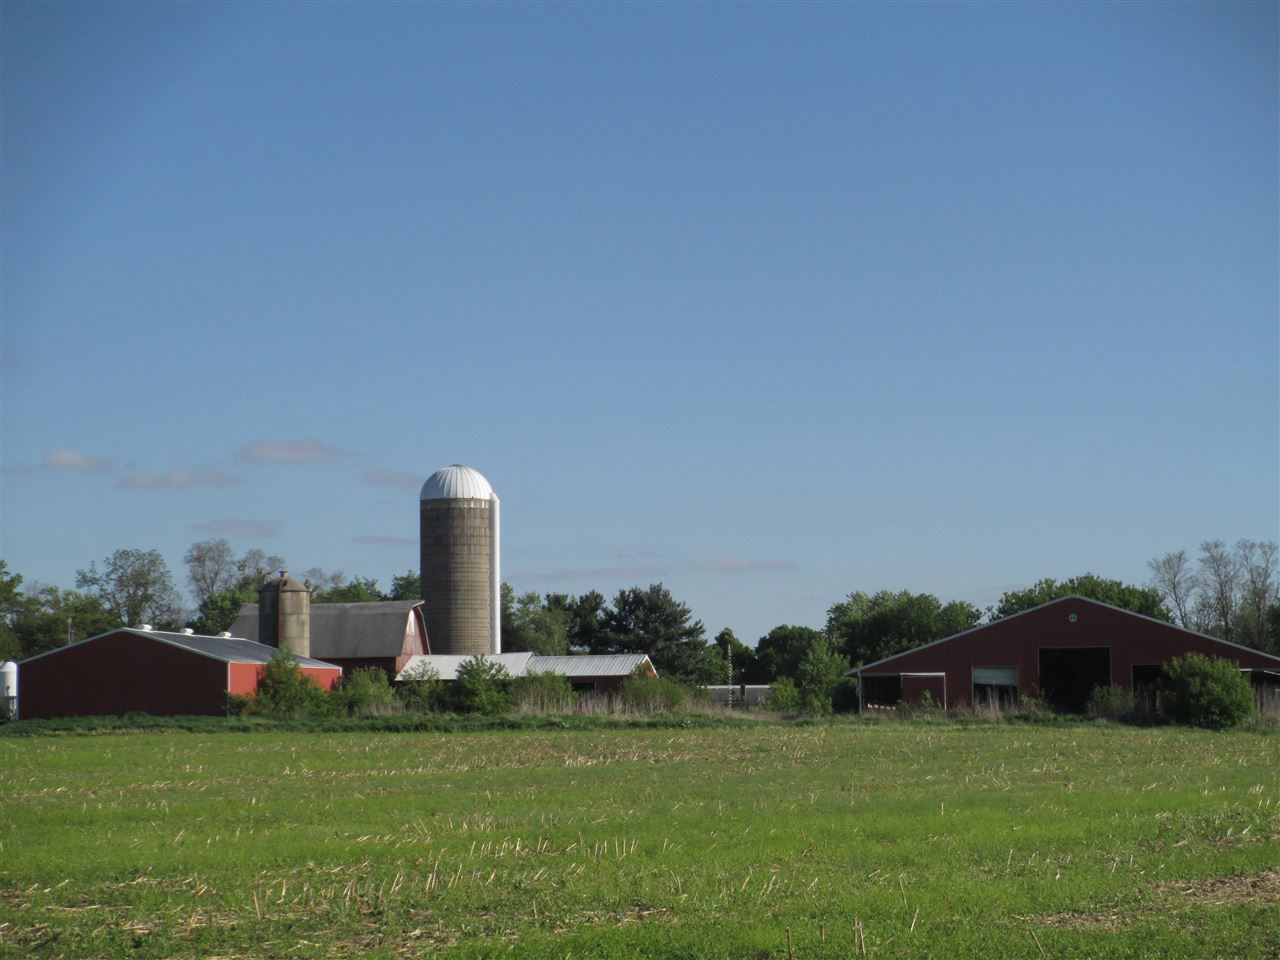 4305 N County Road M, Magnolia, WI 53536